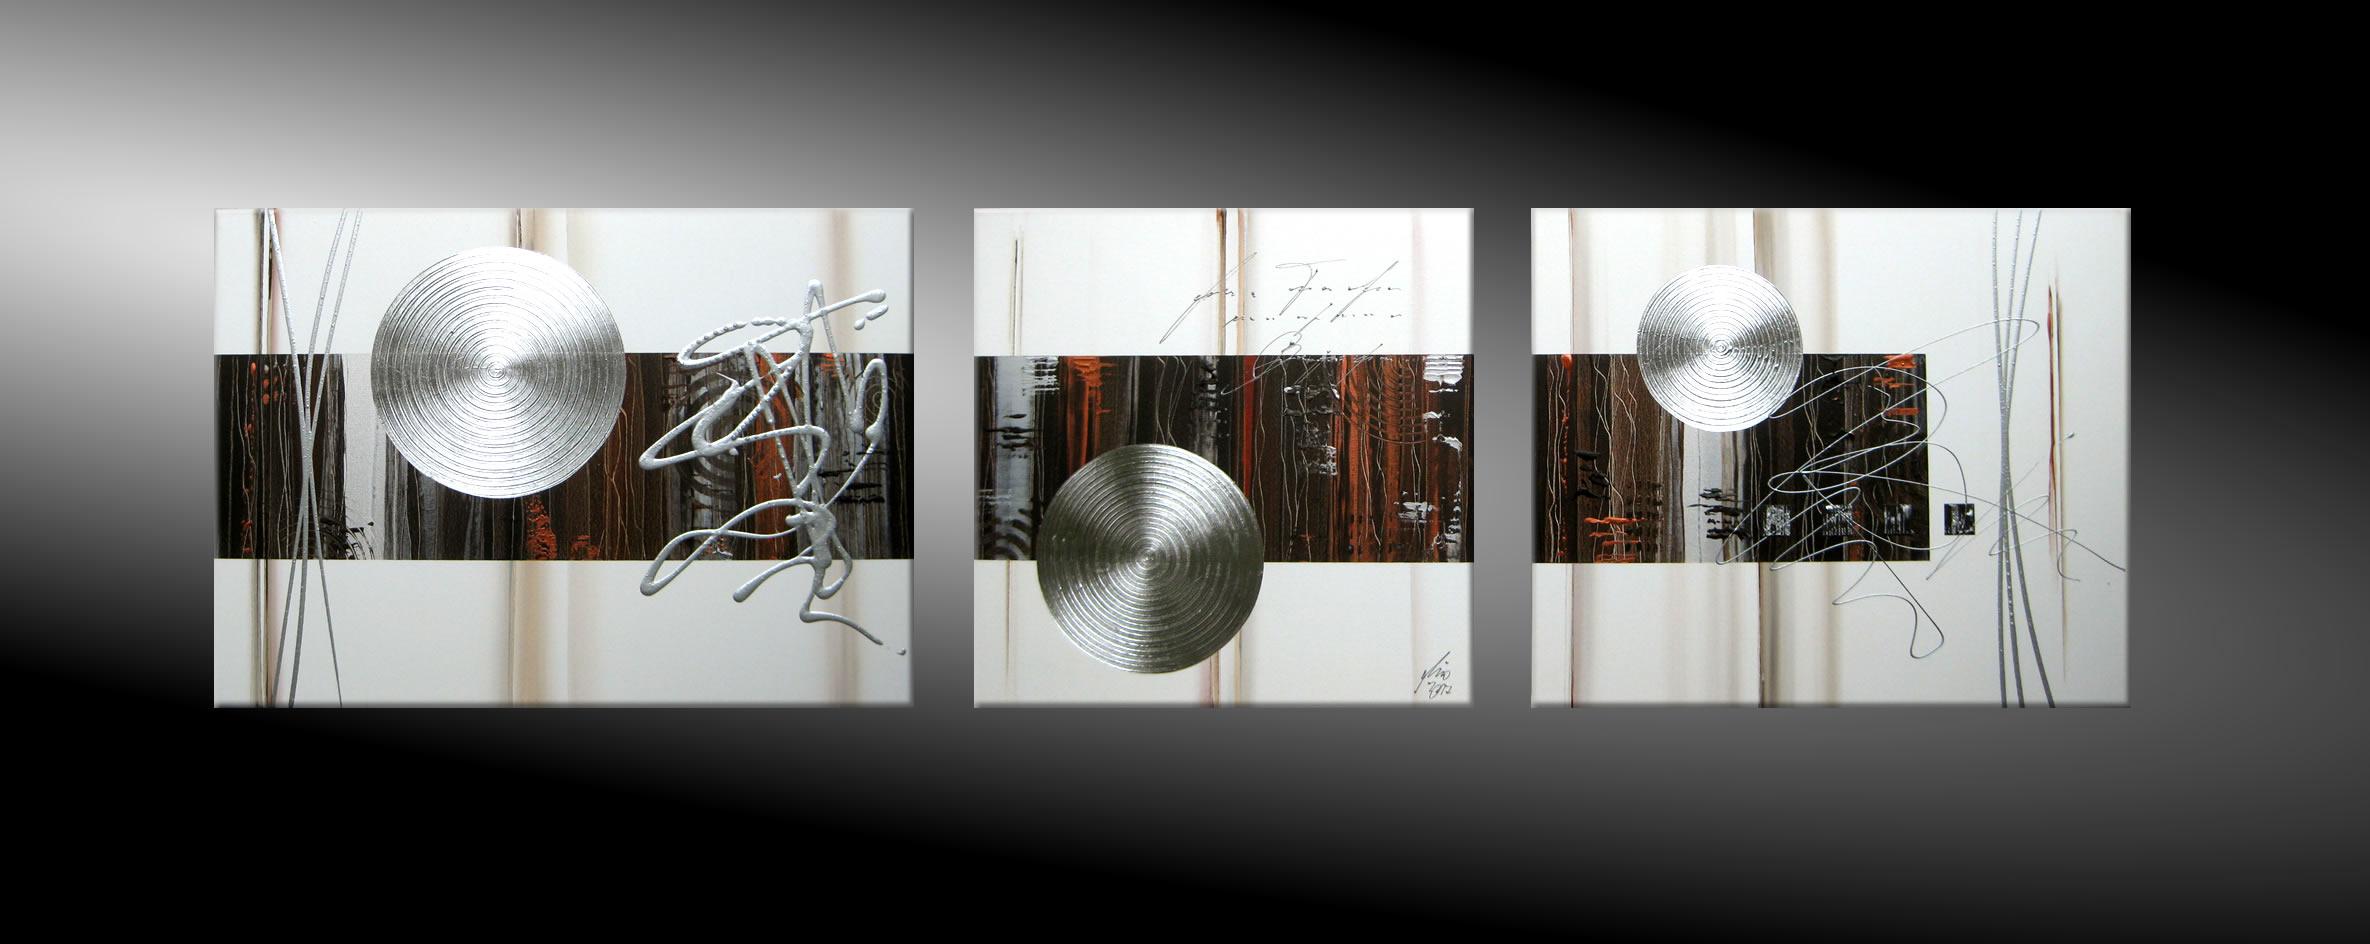 moderne kunst acrylbild malerei leinwand bilder original. Black Bedroom Furniture Sets. Home Design Ideas